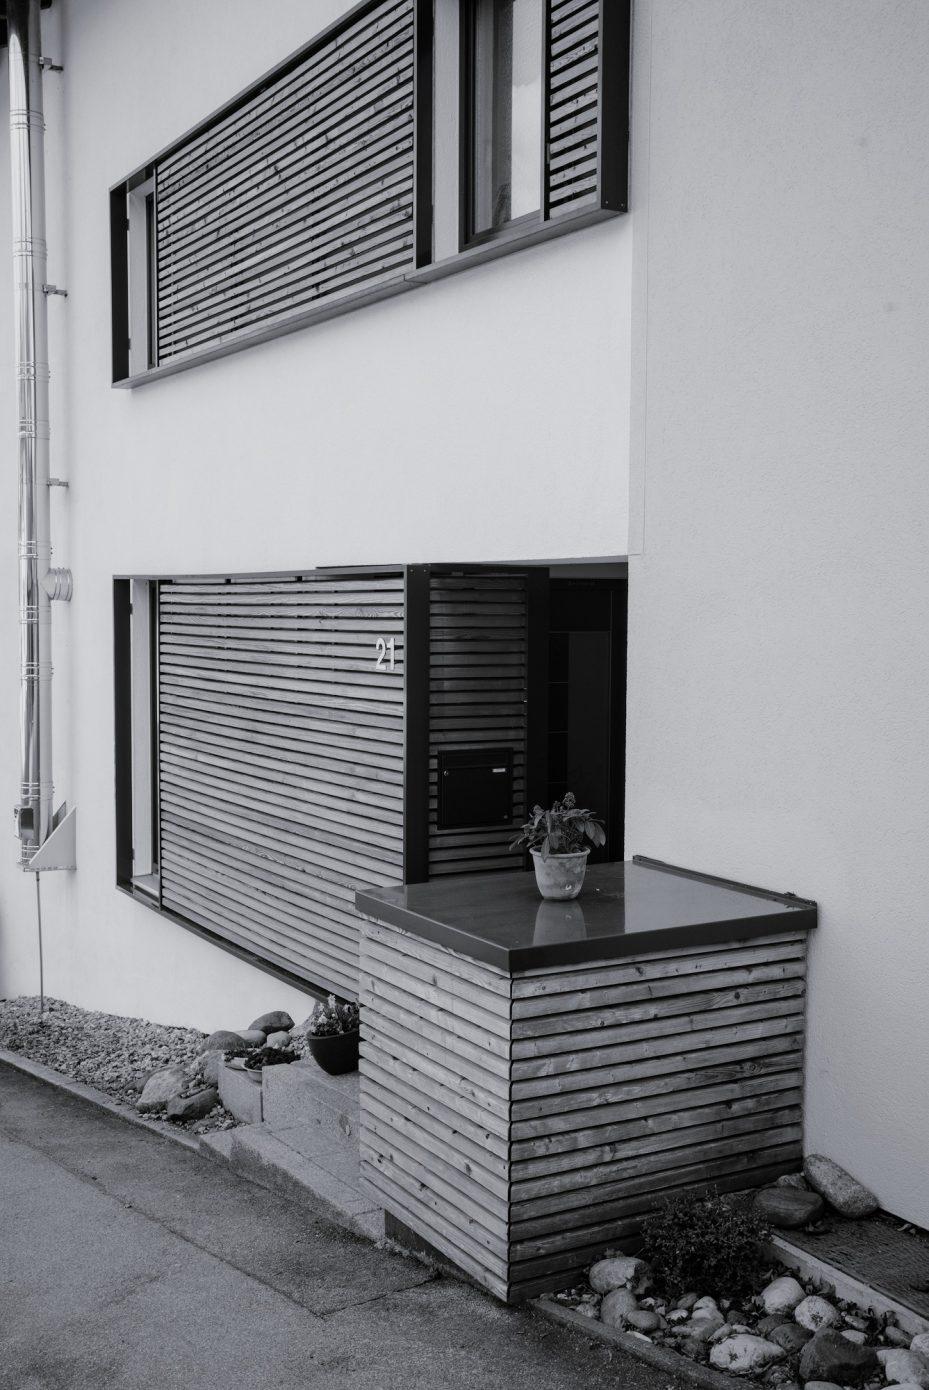 Little_wooden_Boxes.jpg